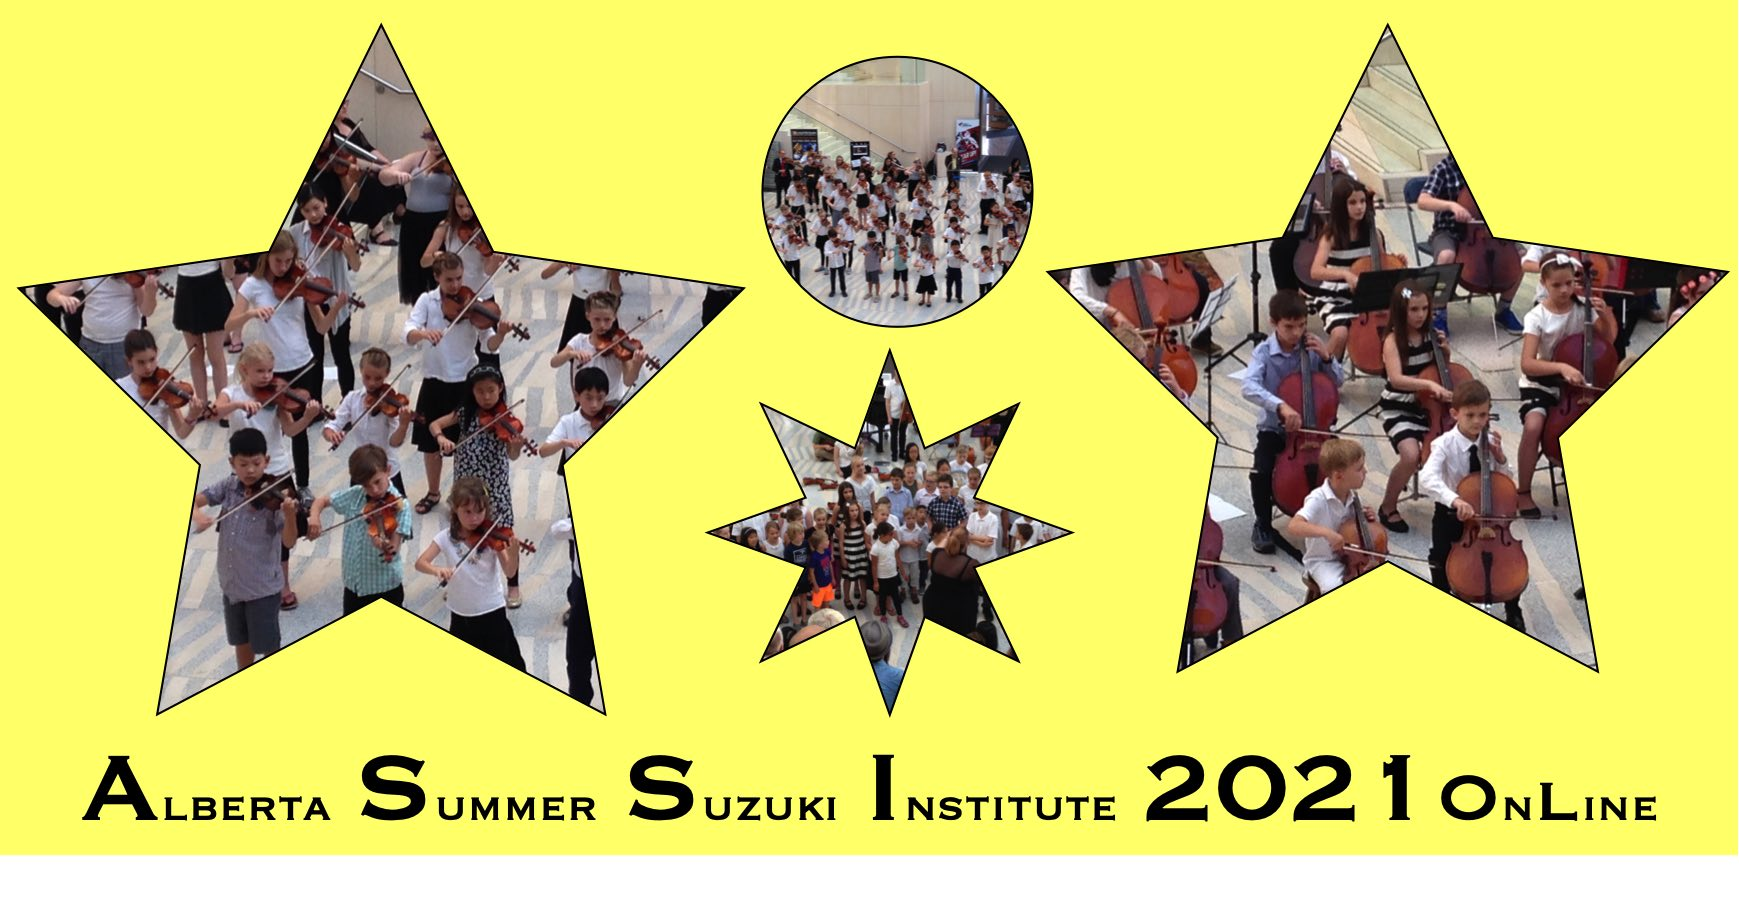 Alberta Summer Suzuki Institute